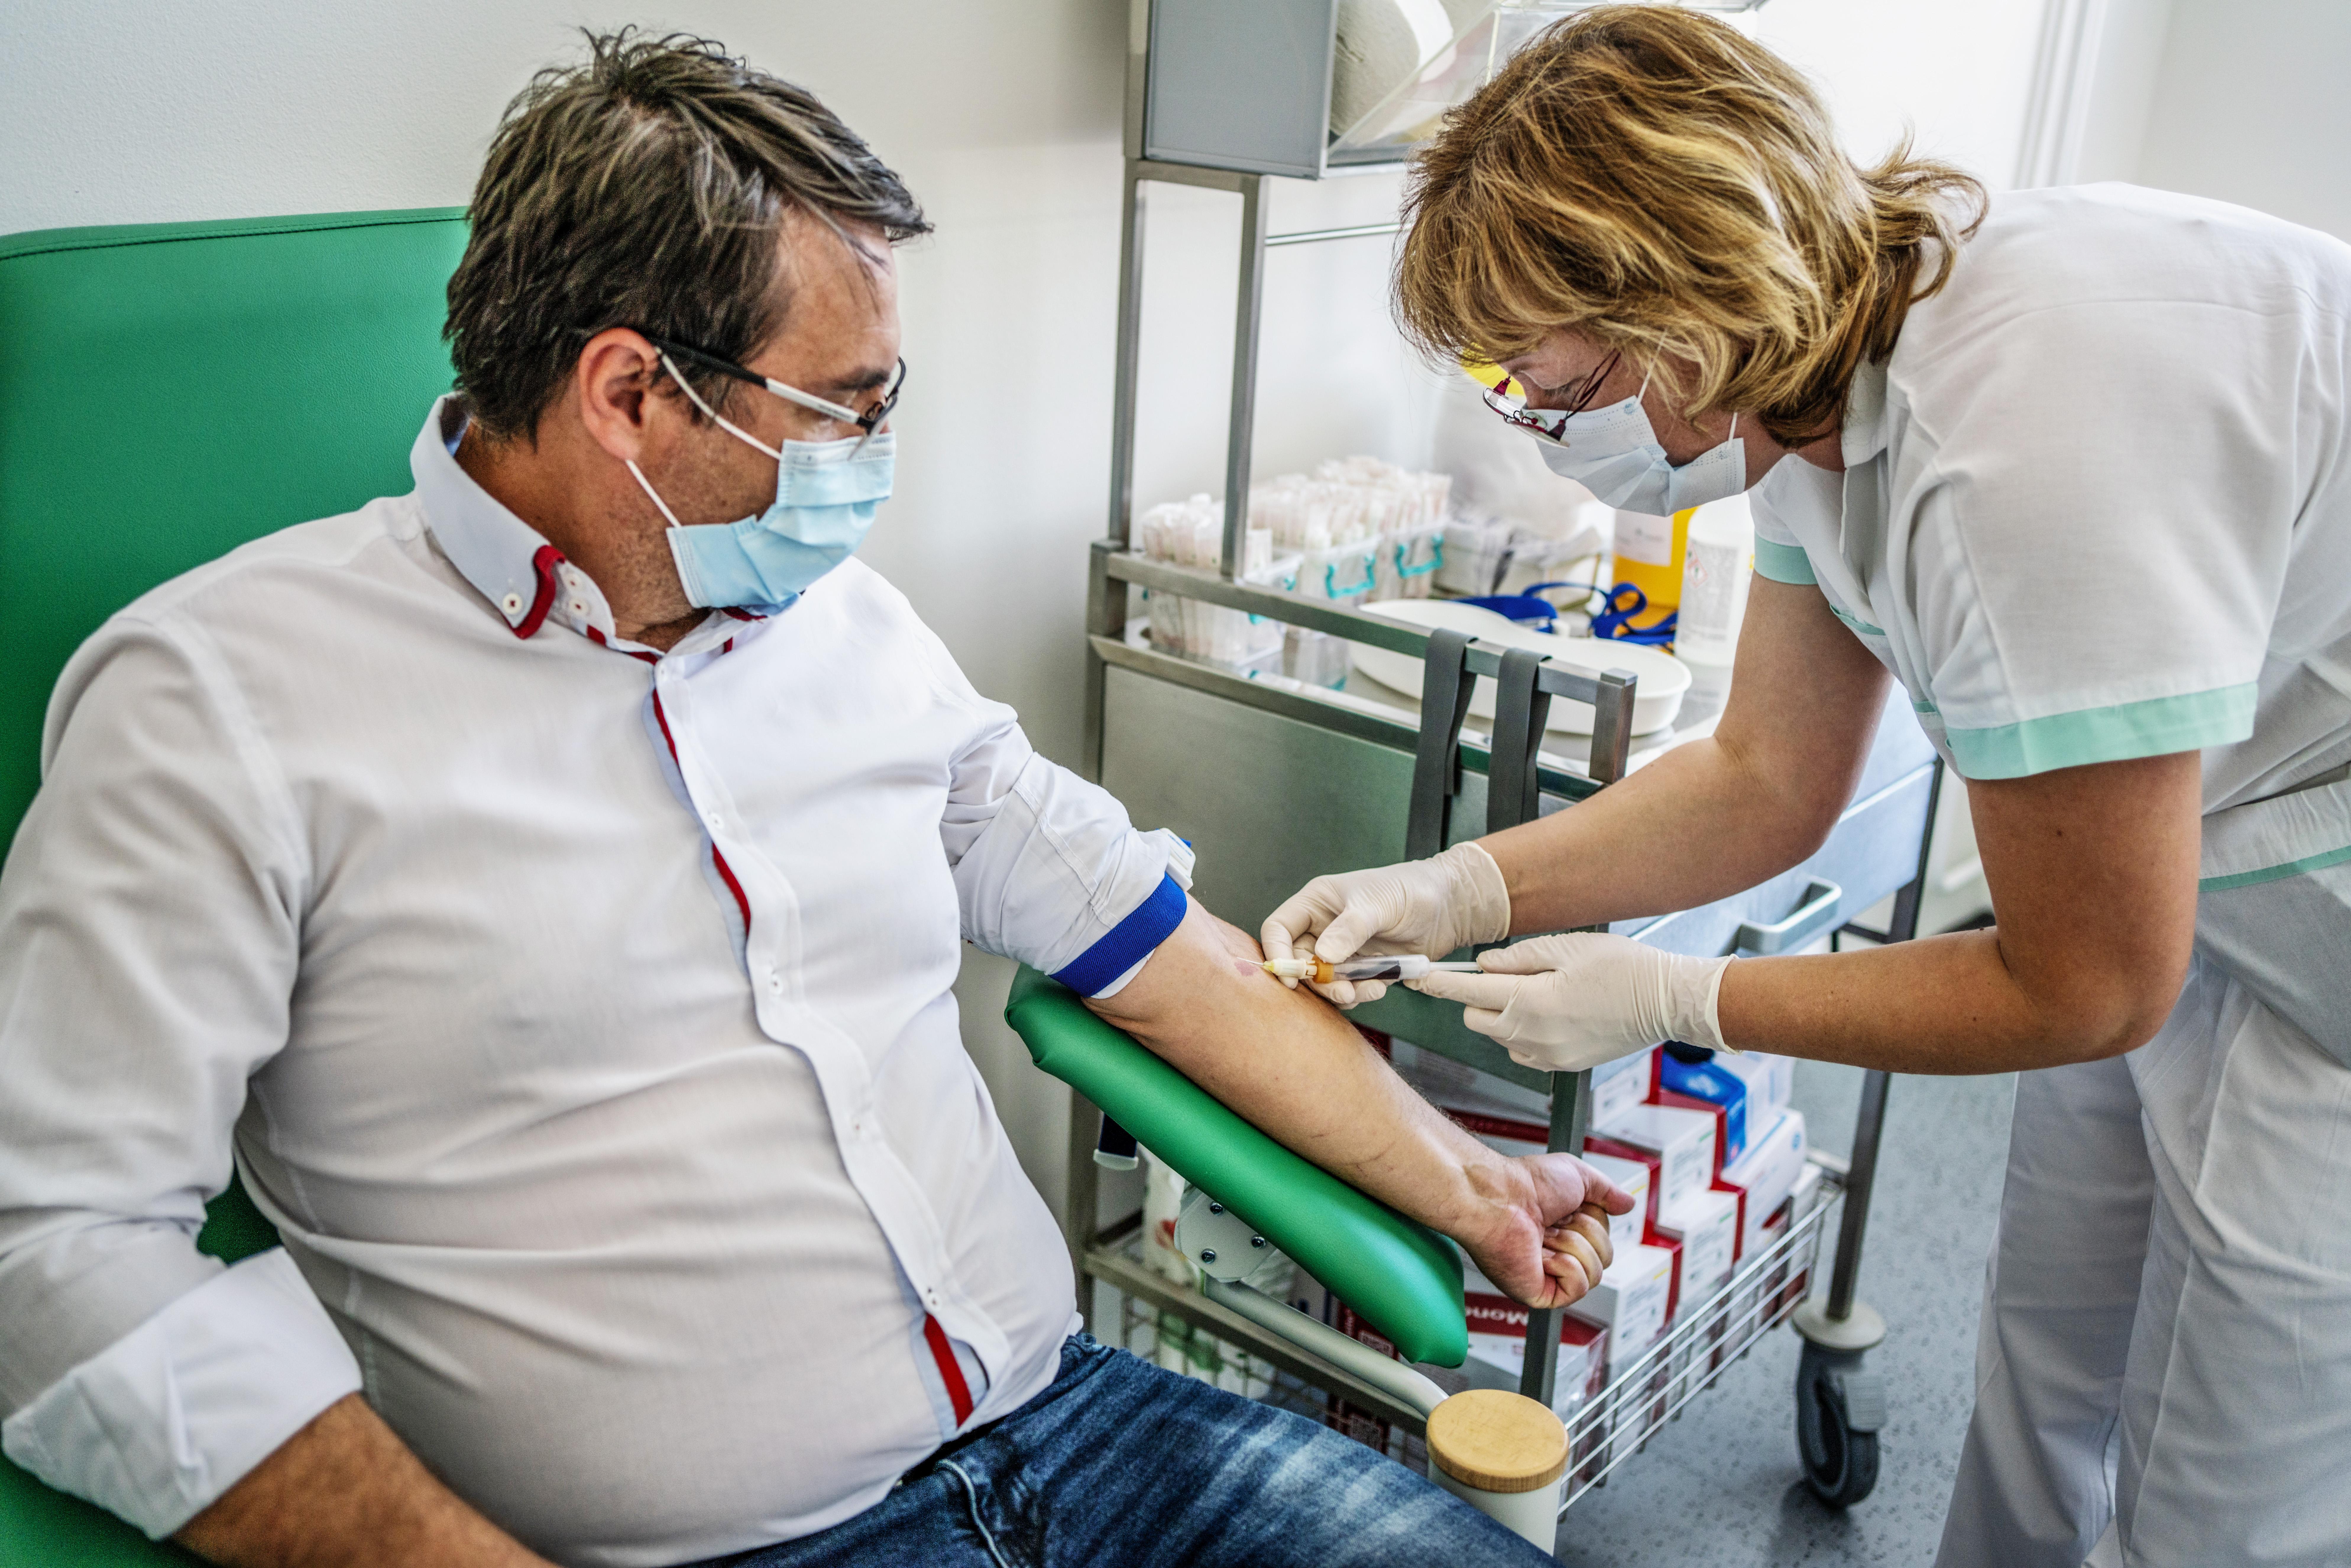 SKODA AUTO offers its workforce free rapid coronavirus antibody tests - Image 1